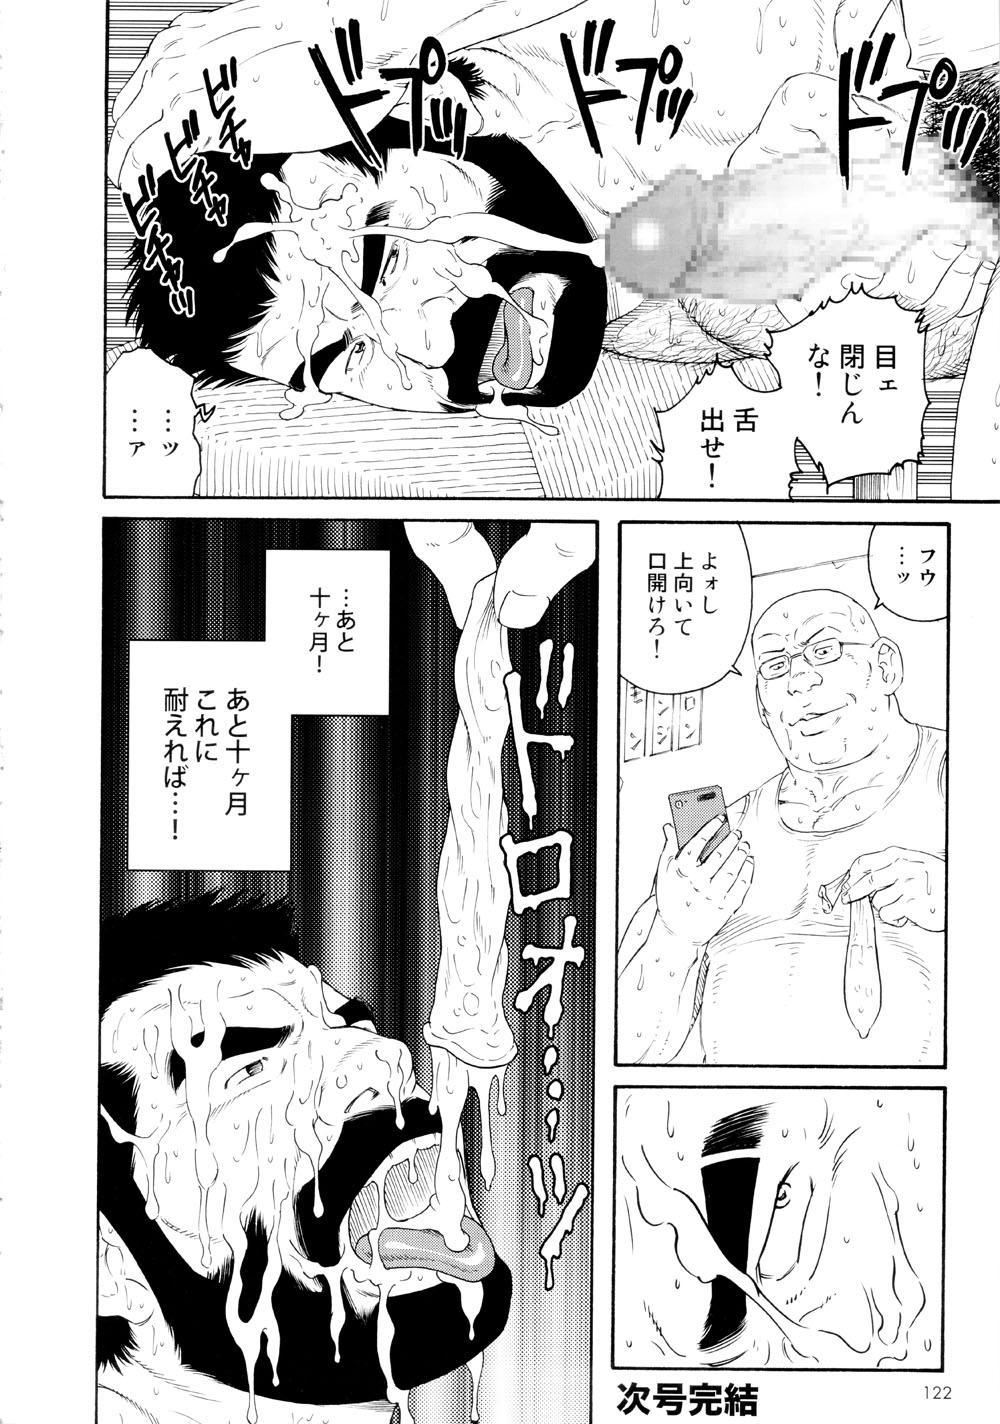 Genryu Chapter 3 15